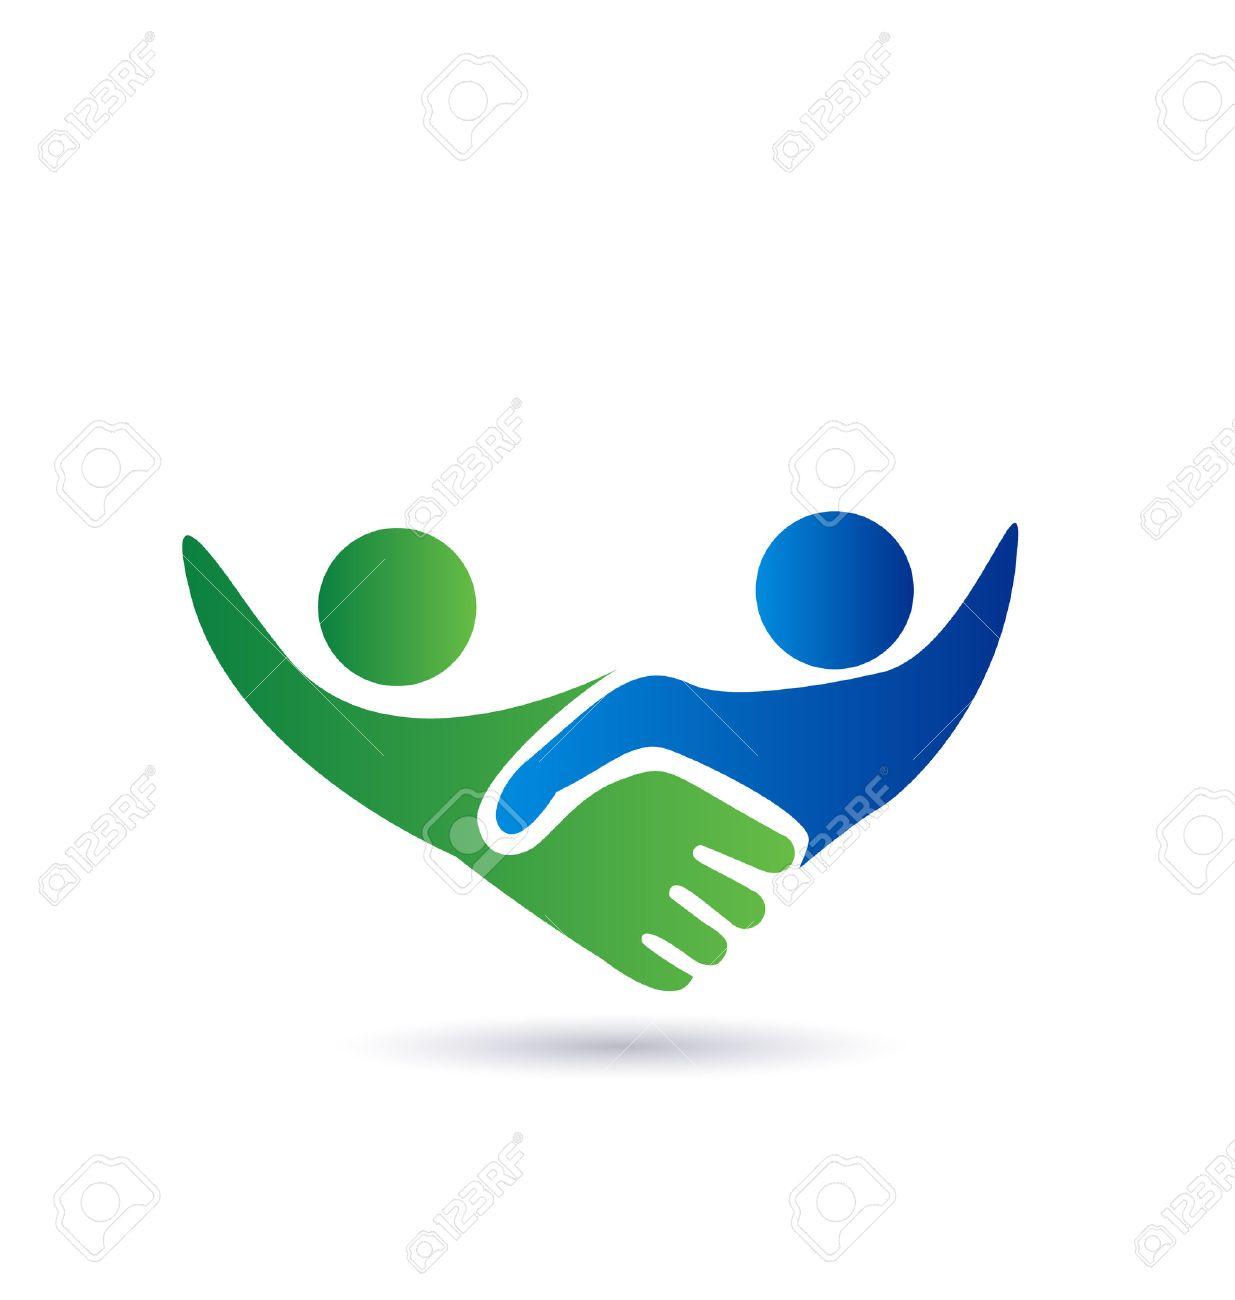 Handshake people in business vector icon - 34510520